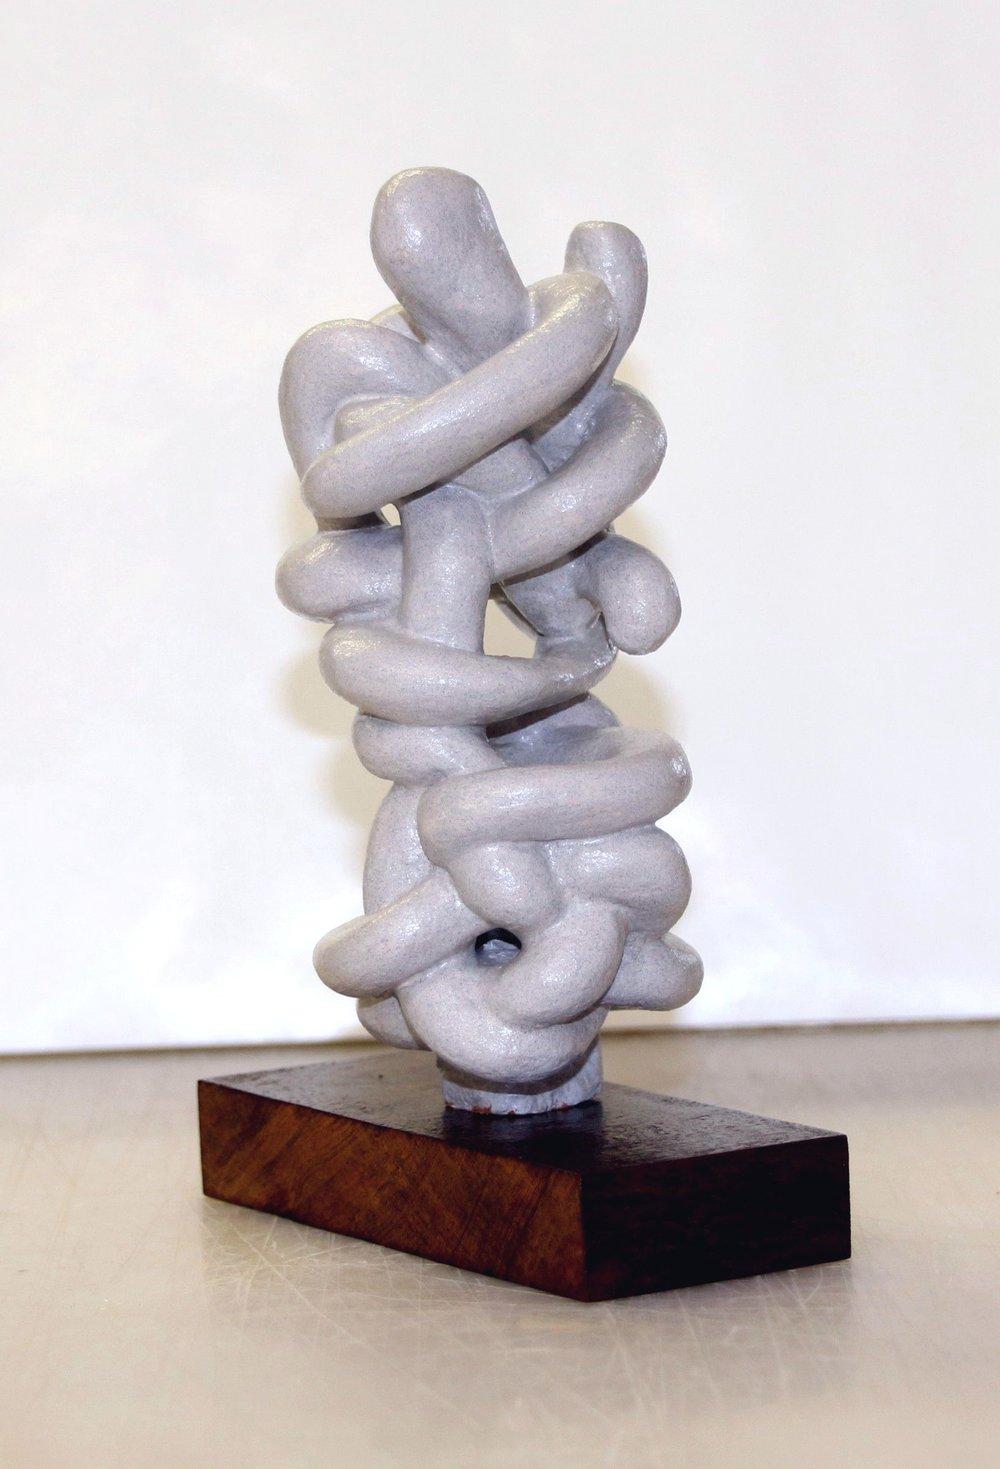 Jim Banks,  Geeta #2 , Acrylic, marble powder, wood, 5x3x7